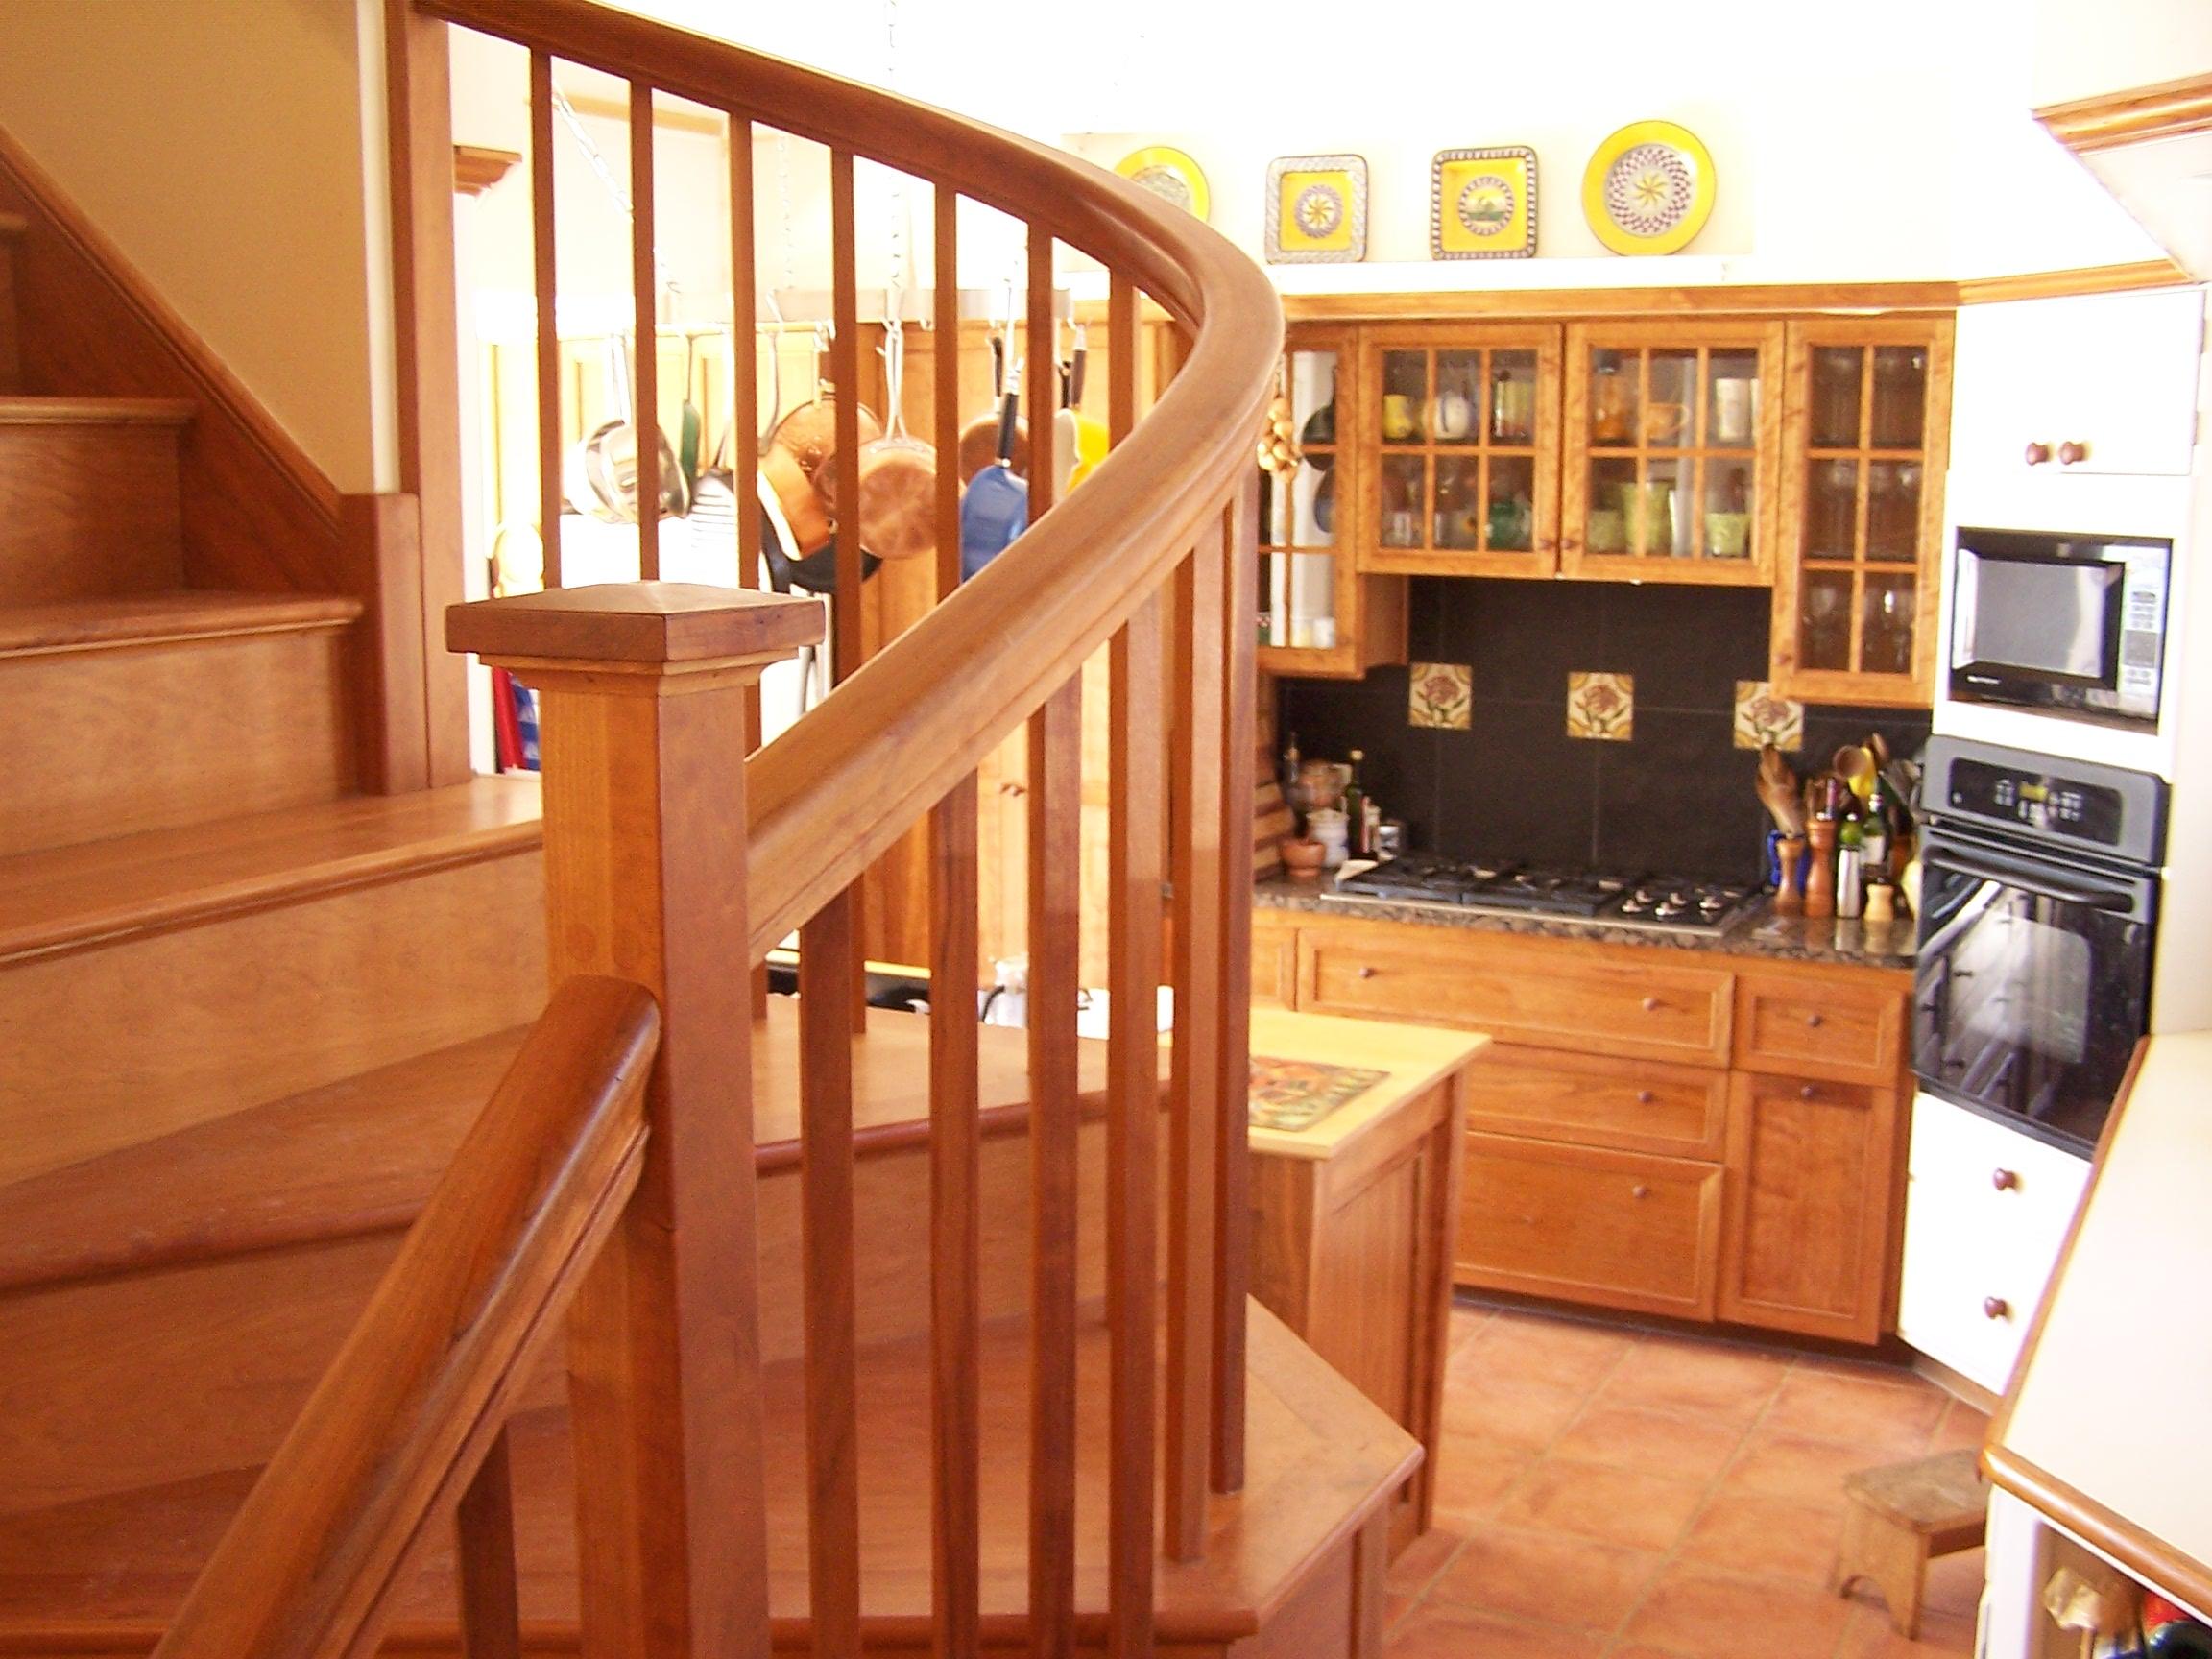 brooklin staircase2.jpg